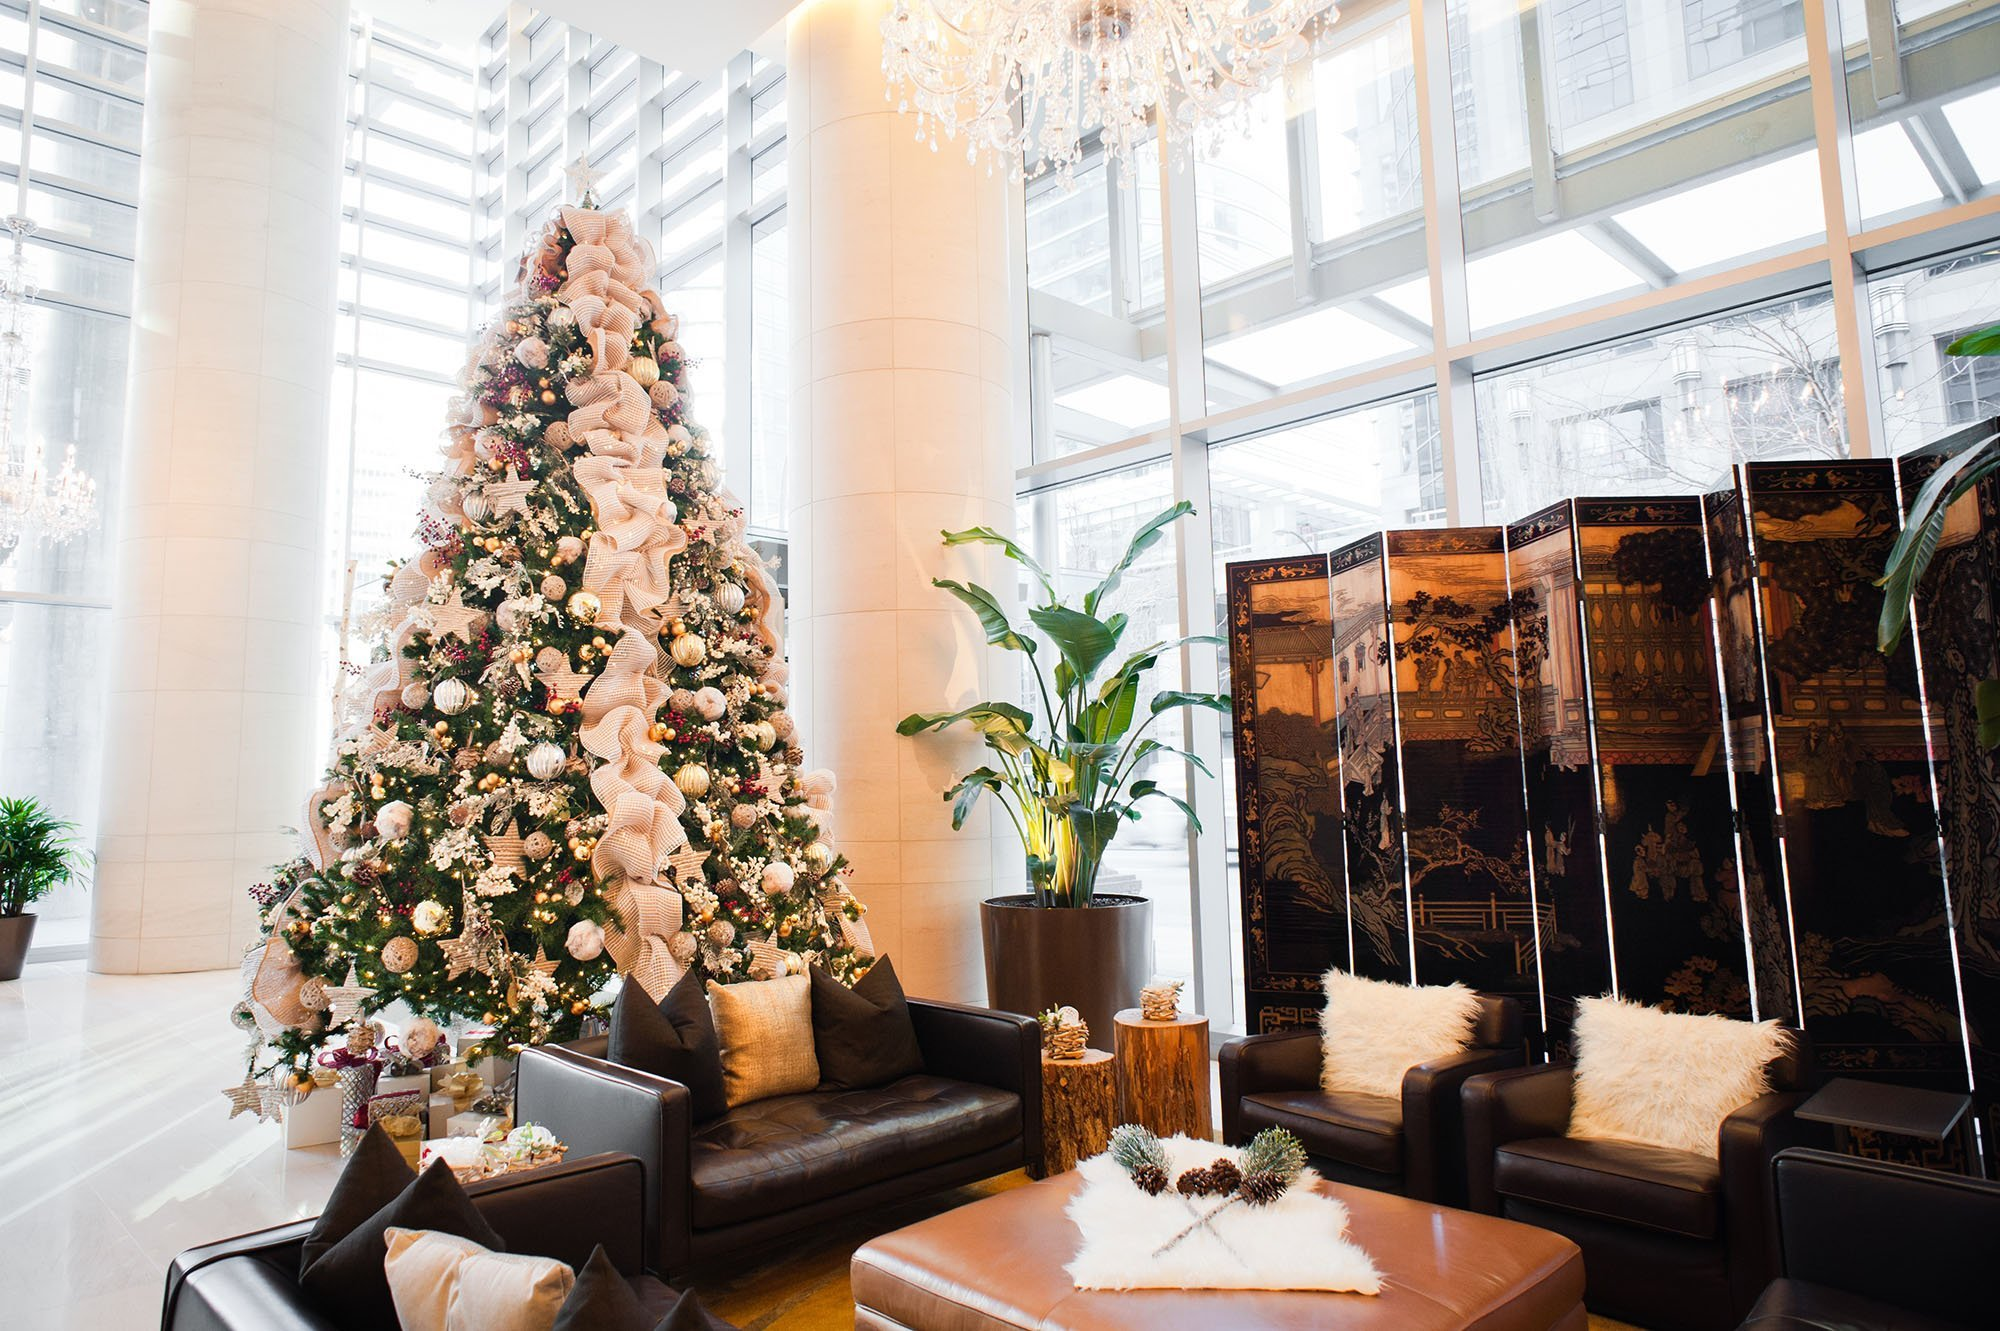 Holiday Displays & Decor